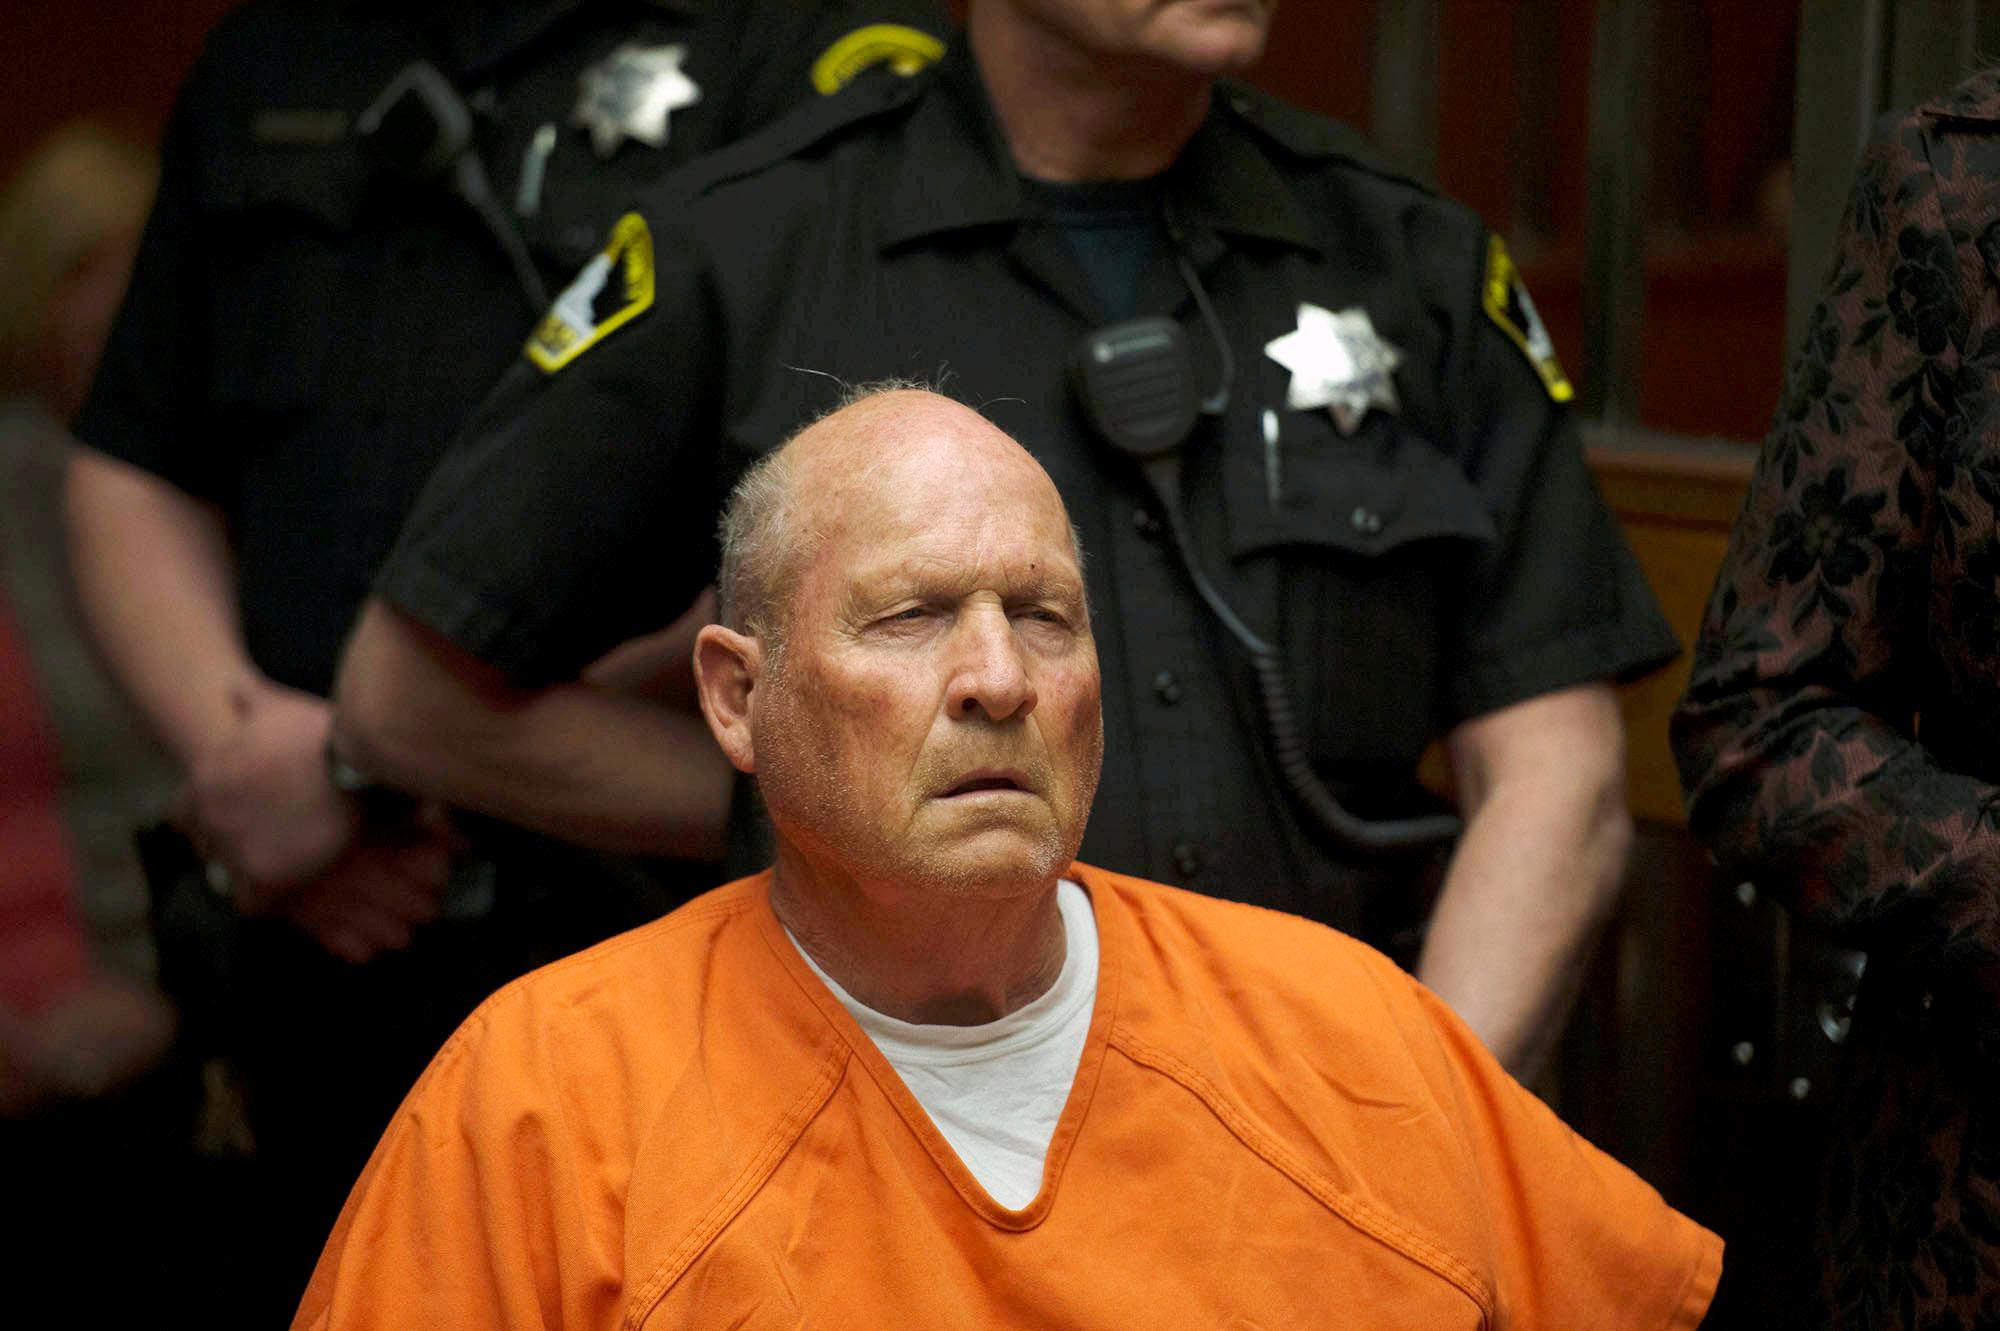 Juez dictamina que se tomarán fotos del pene de Joseph DeAngelo al sospechoso de asesinato de Golden State